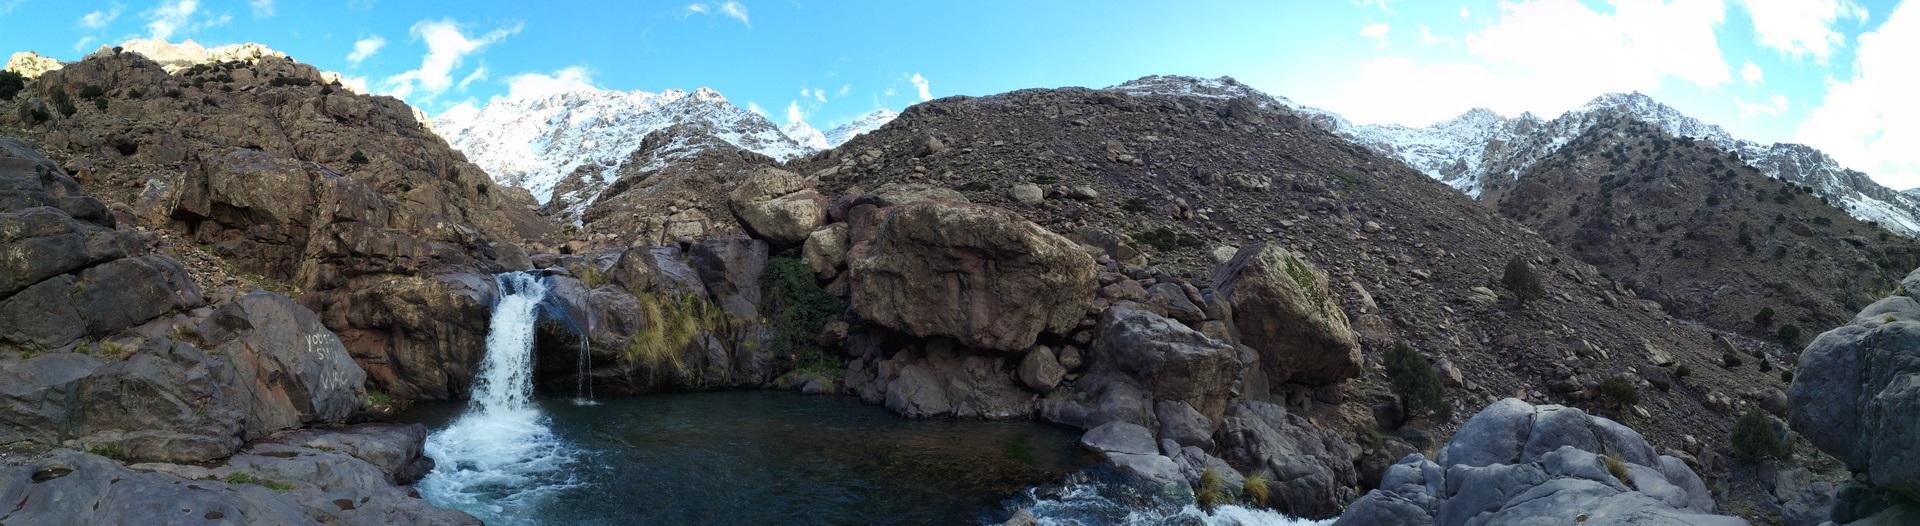 Rejon Sidi Chamarouch